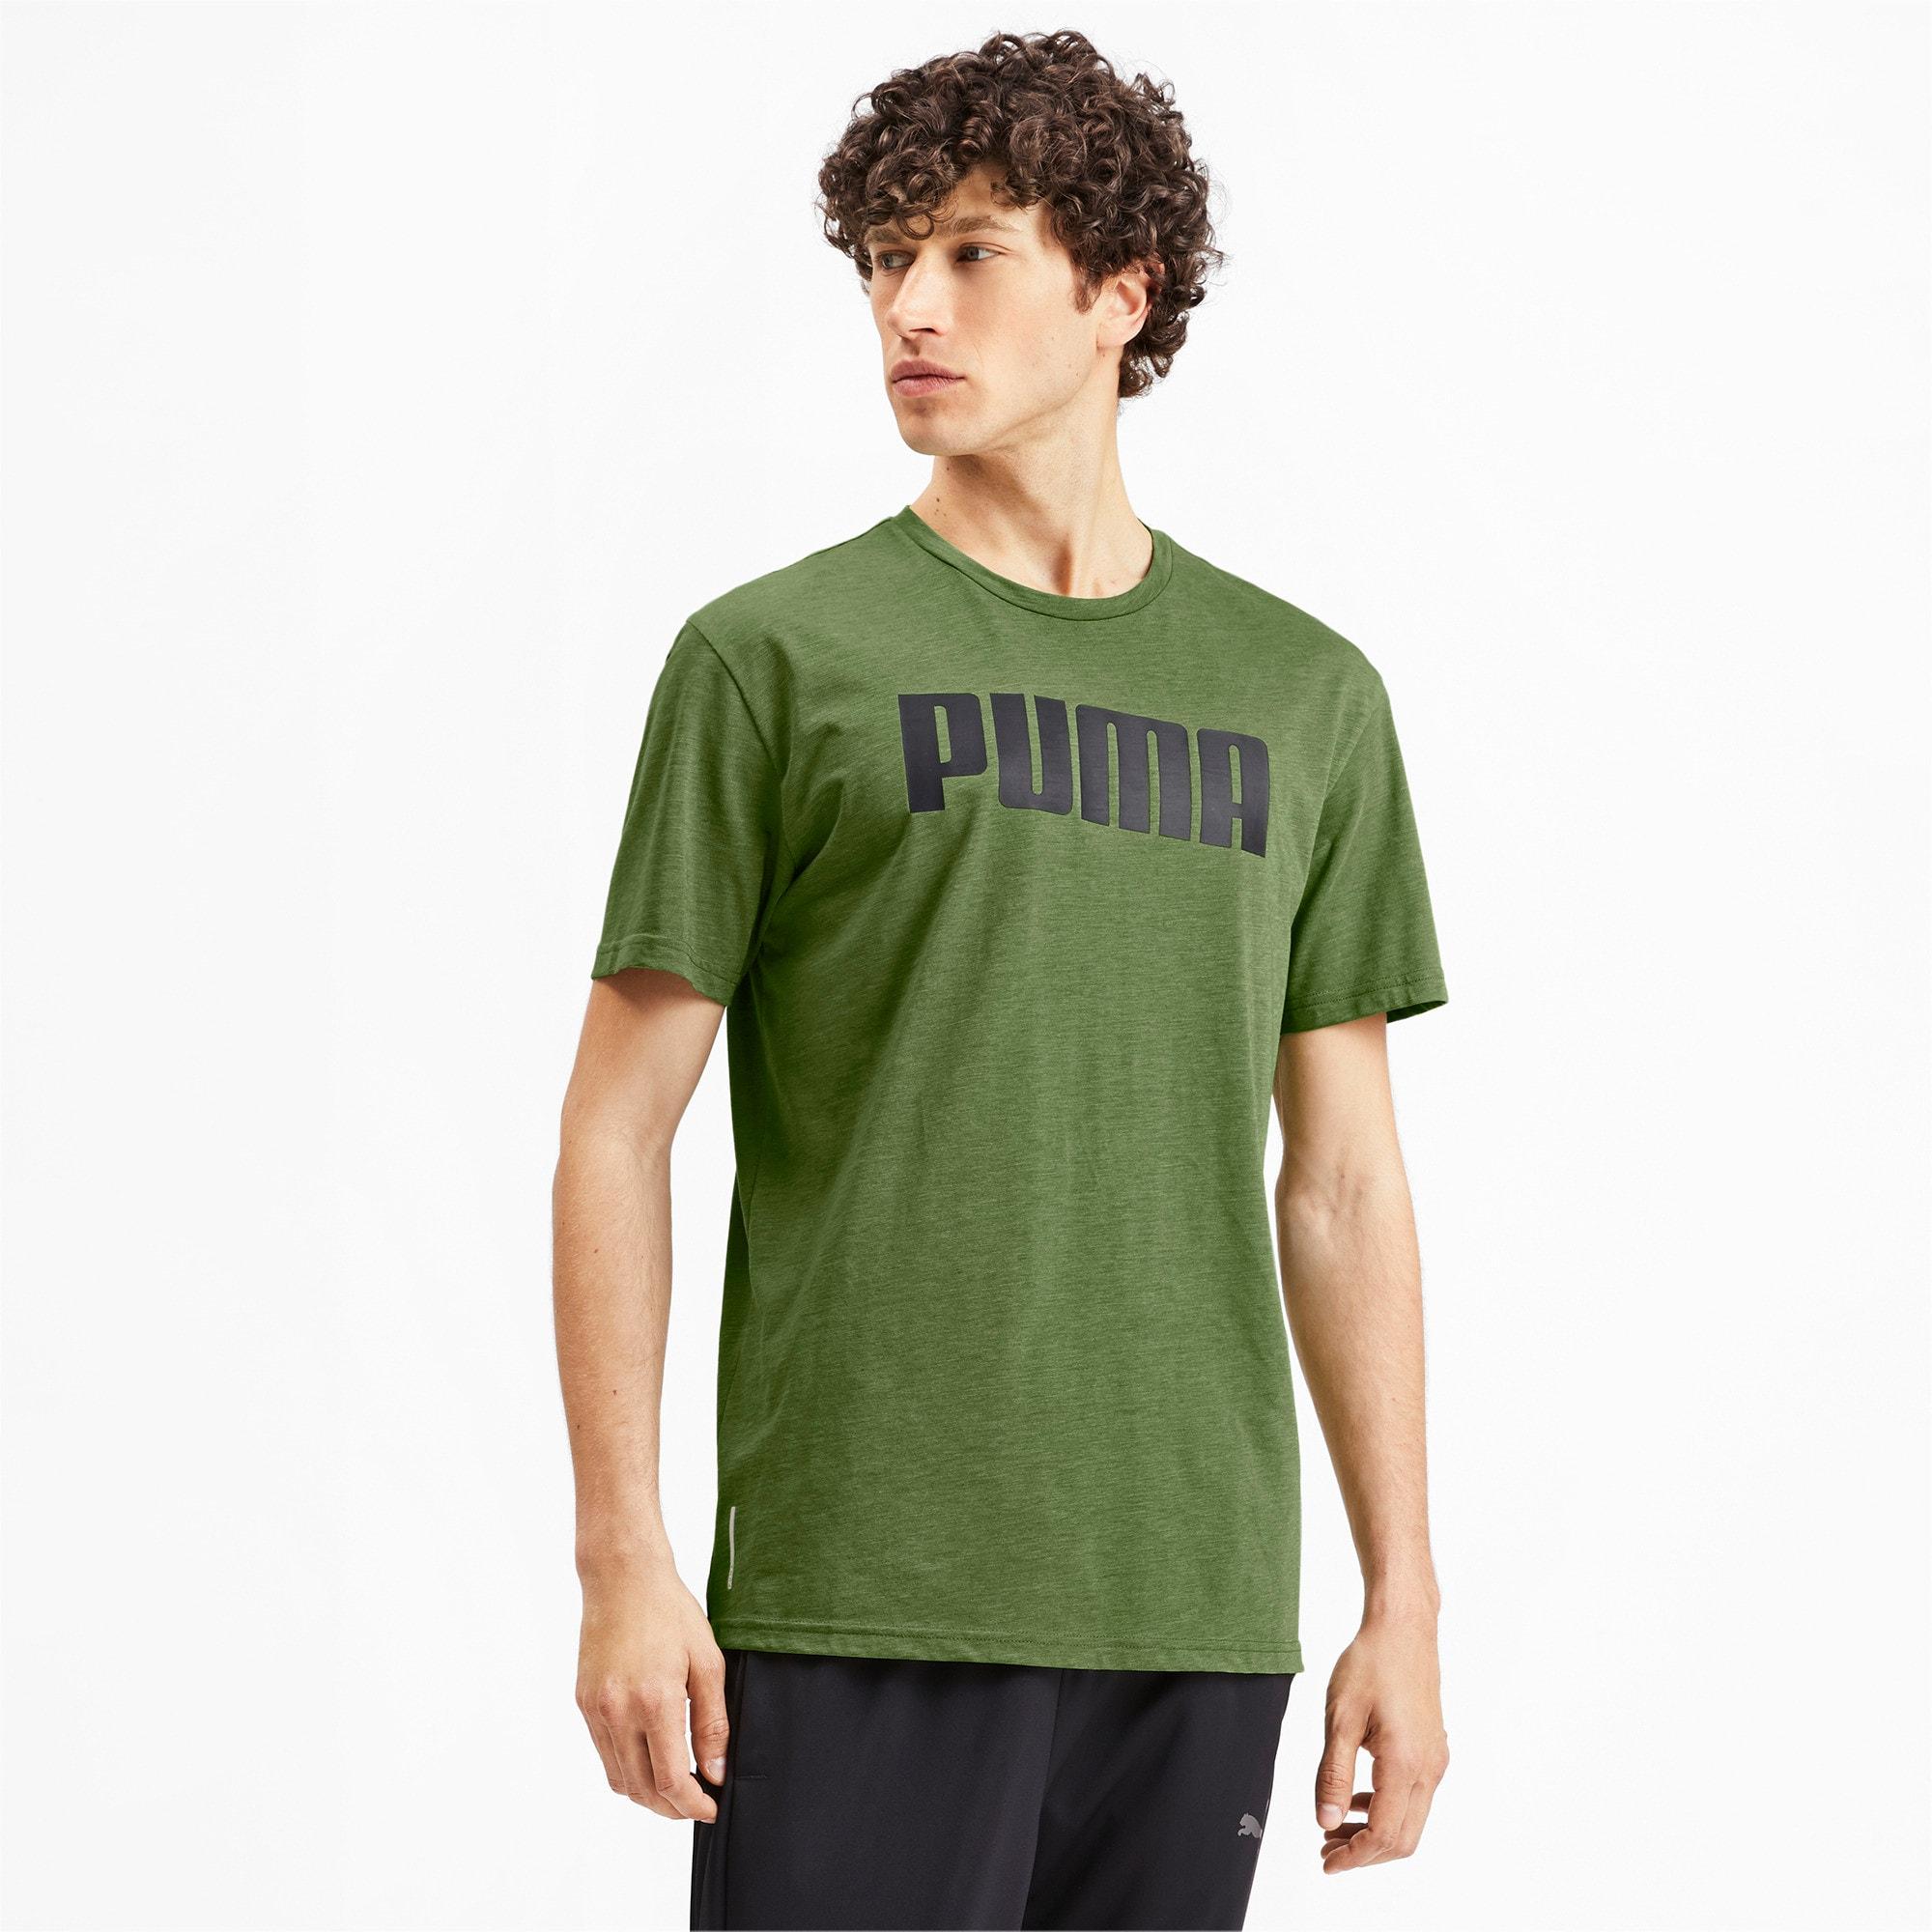 Thumbnail 2 of PUMA Men's Graphic Tee, Garden Green Heather, medium